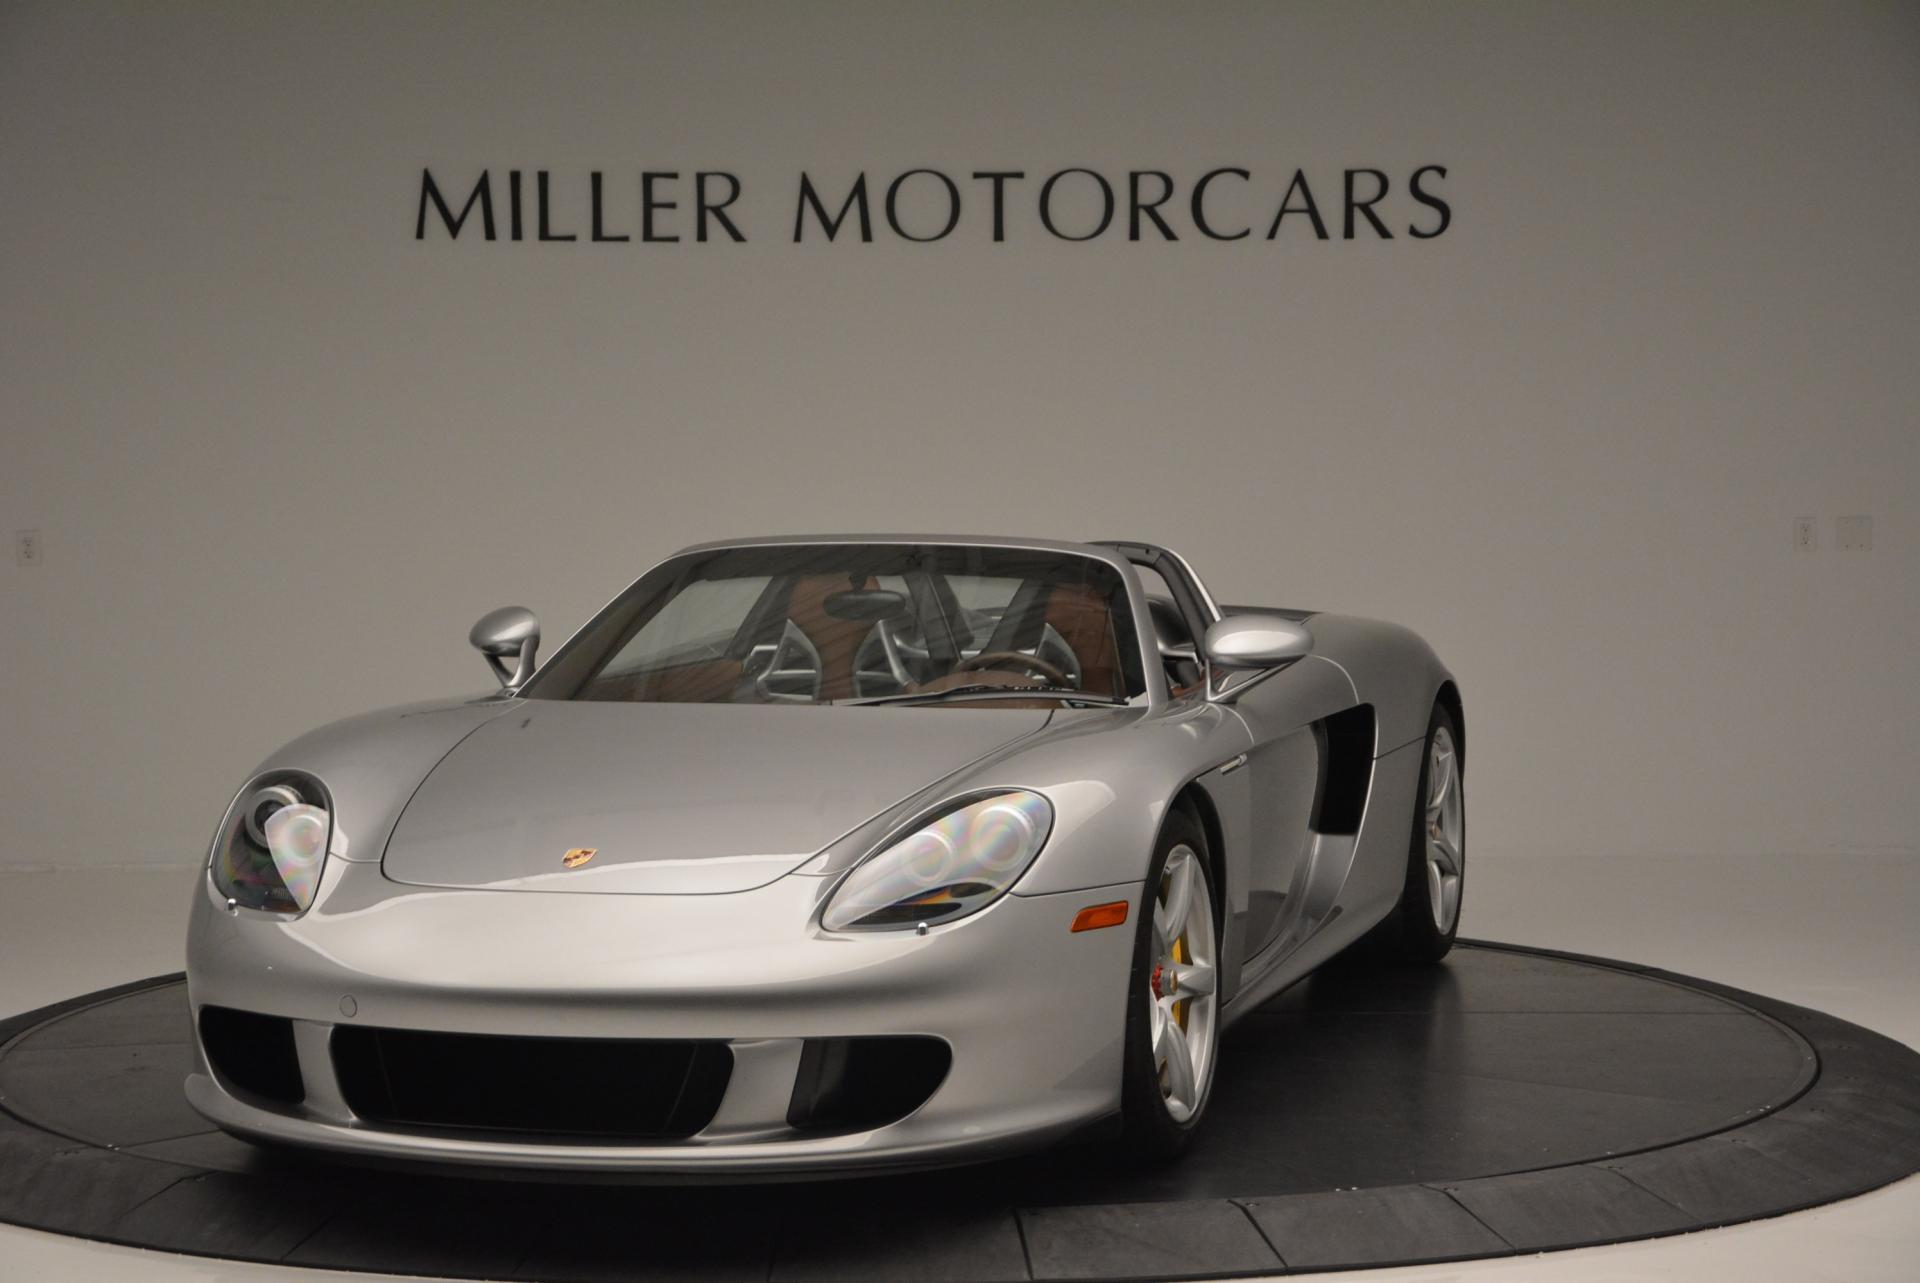 Used 2005 Porsche Carrera GT  For Sale In Greenwich, CT 108_p2